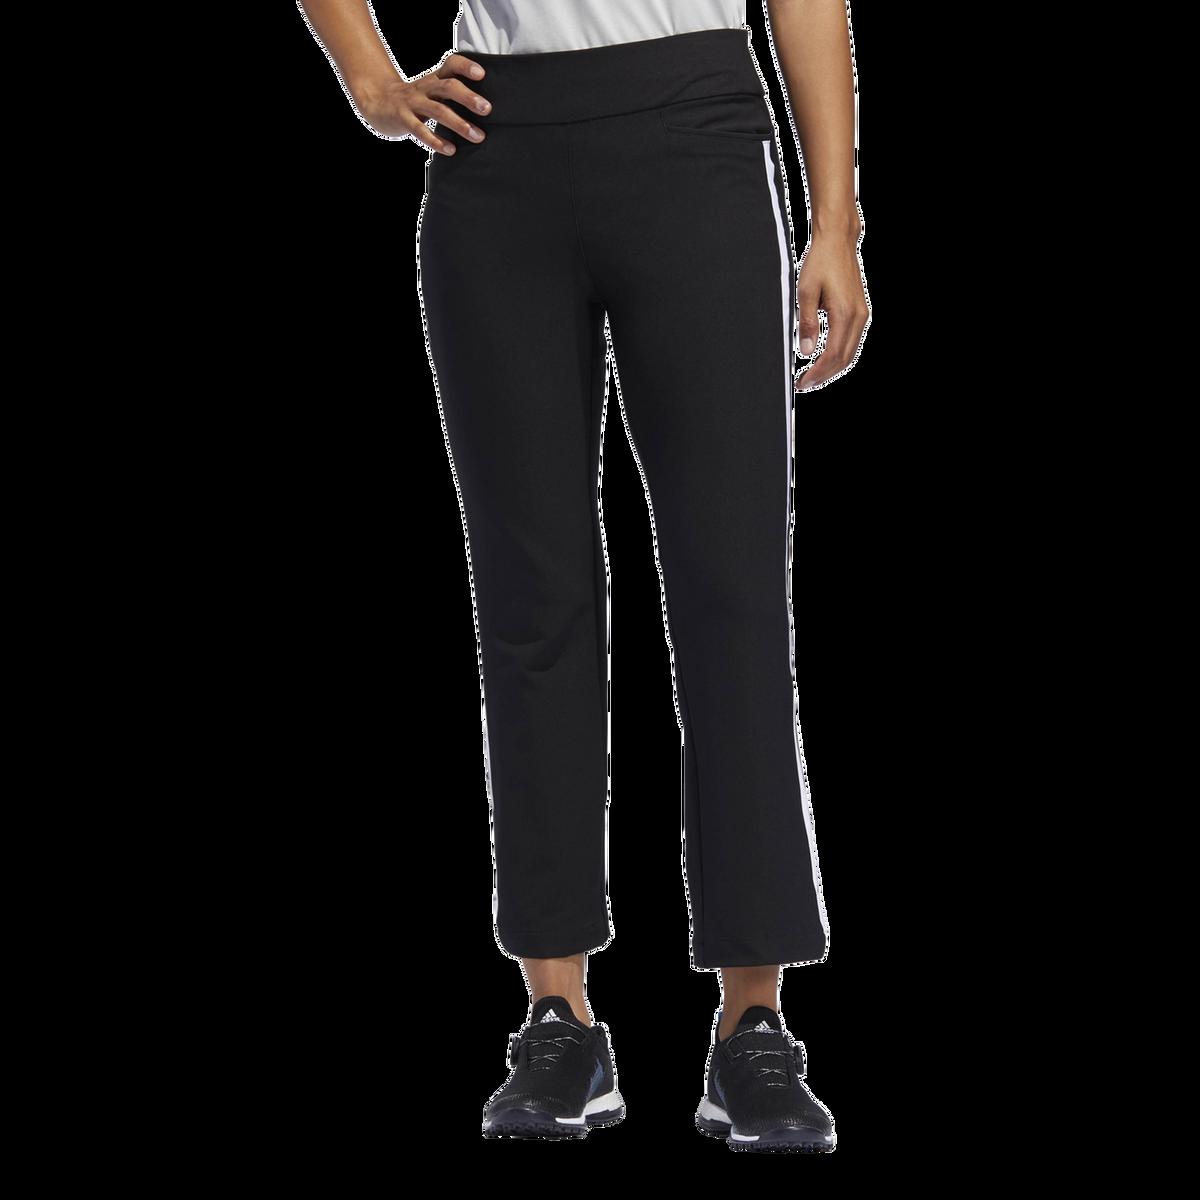 627ce1b0d0 Ultimate365 Novelty Cropped Pants